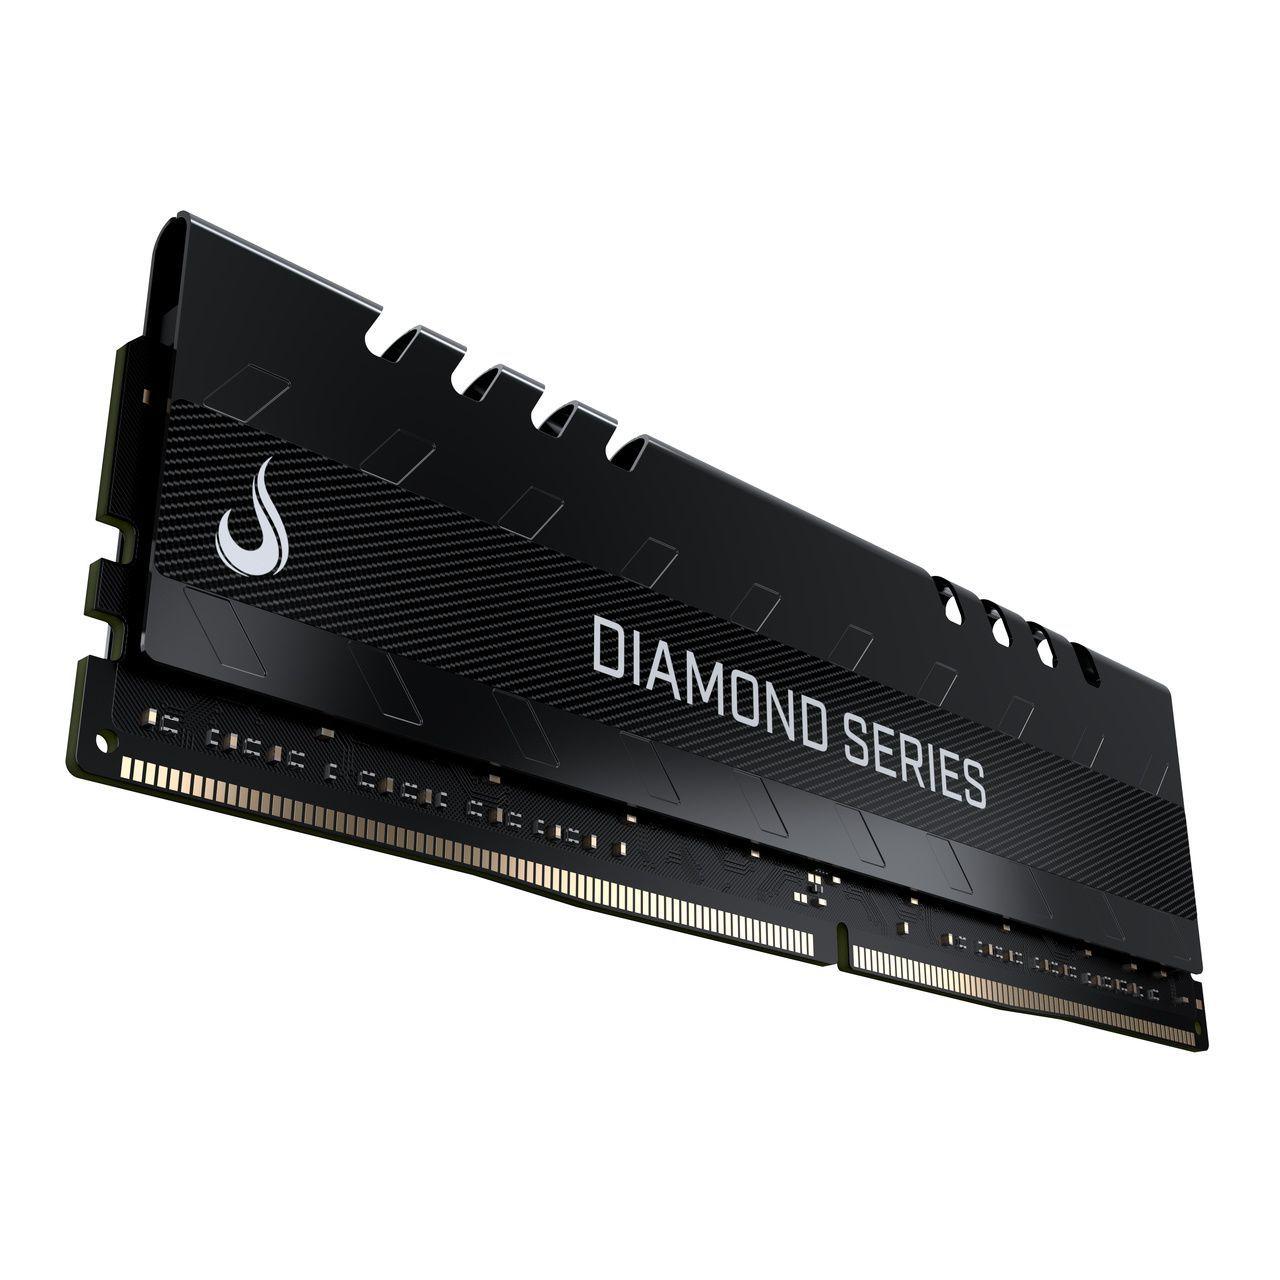 Memoria Ram DDR4 8GB 2400MHZ Diamond - RM-D4-8G-2400D BLACK